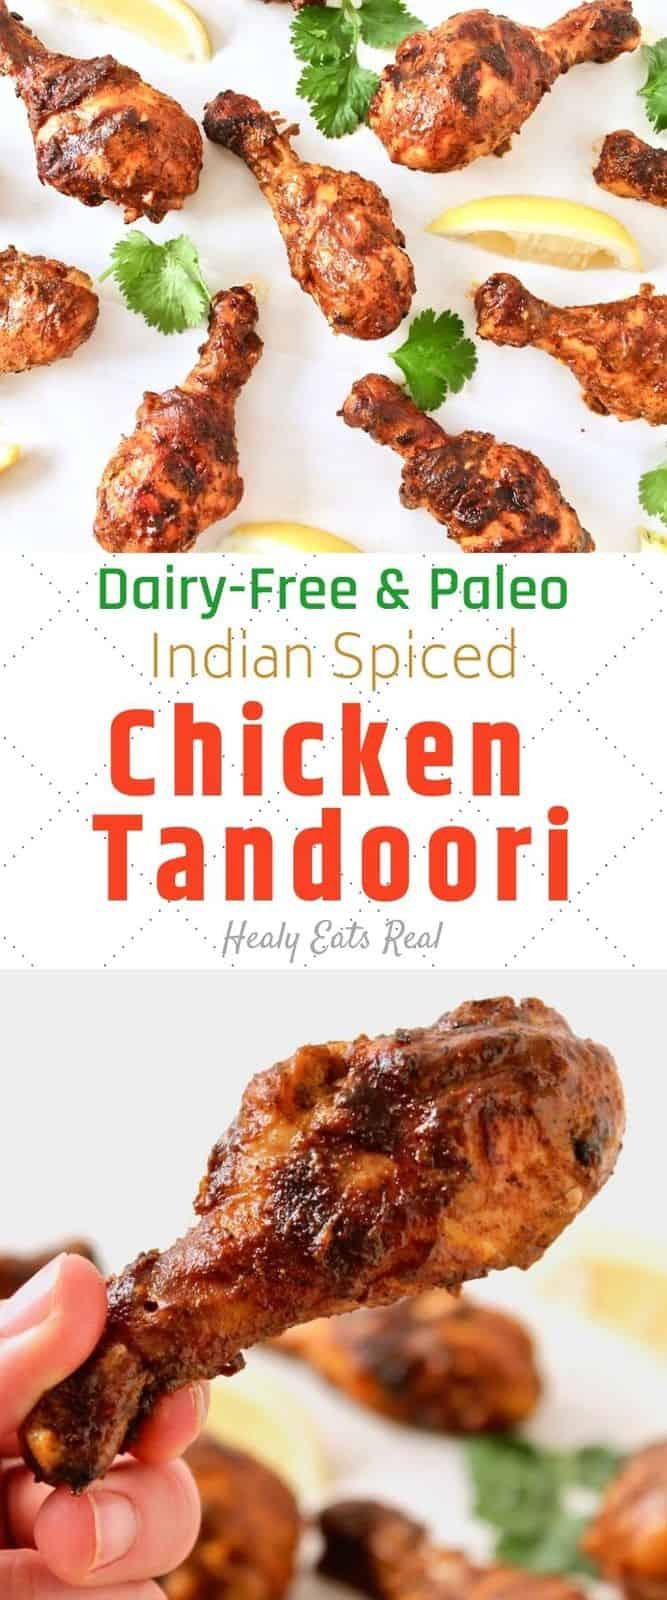 Juicy Chicken Tandoori Recipe (Dairy-Free, Paleo & Keto)